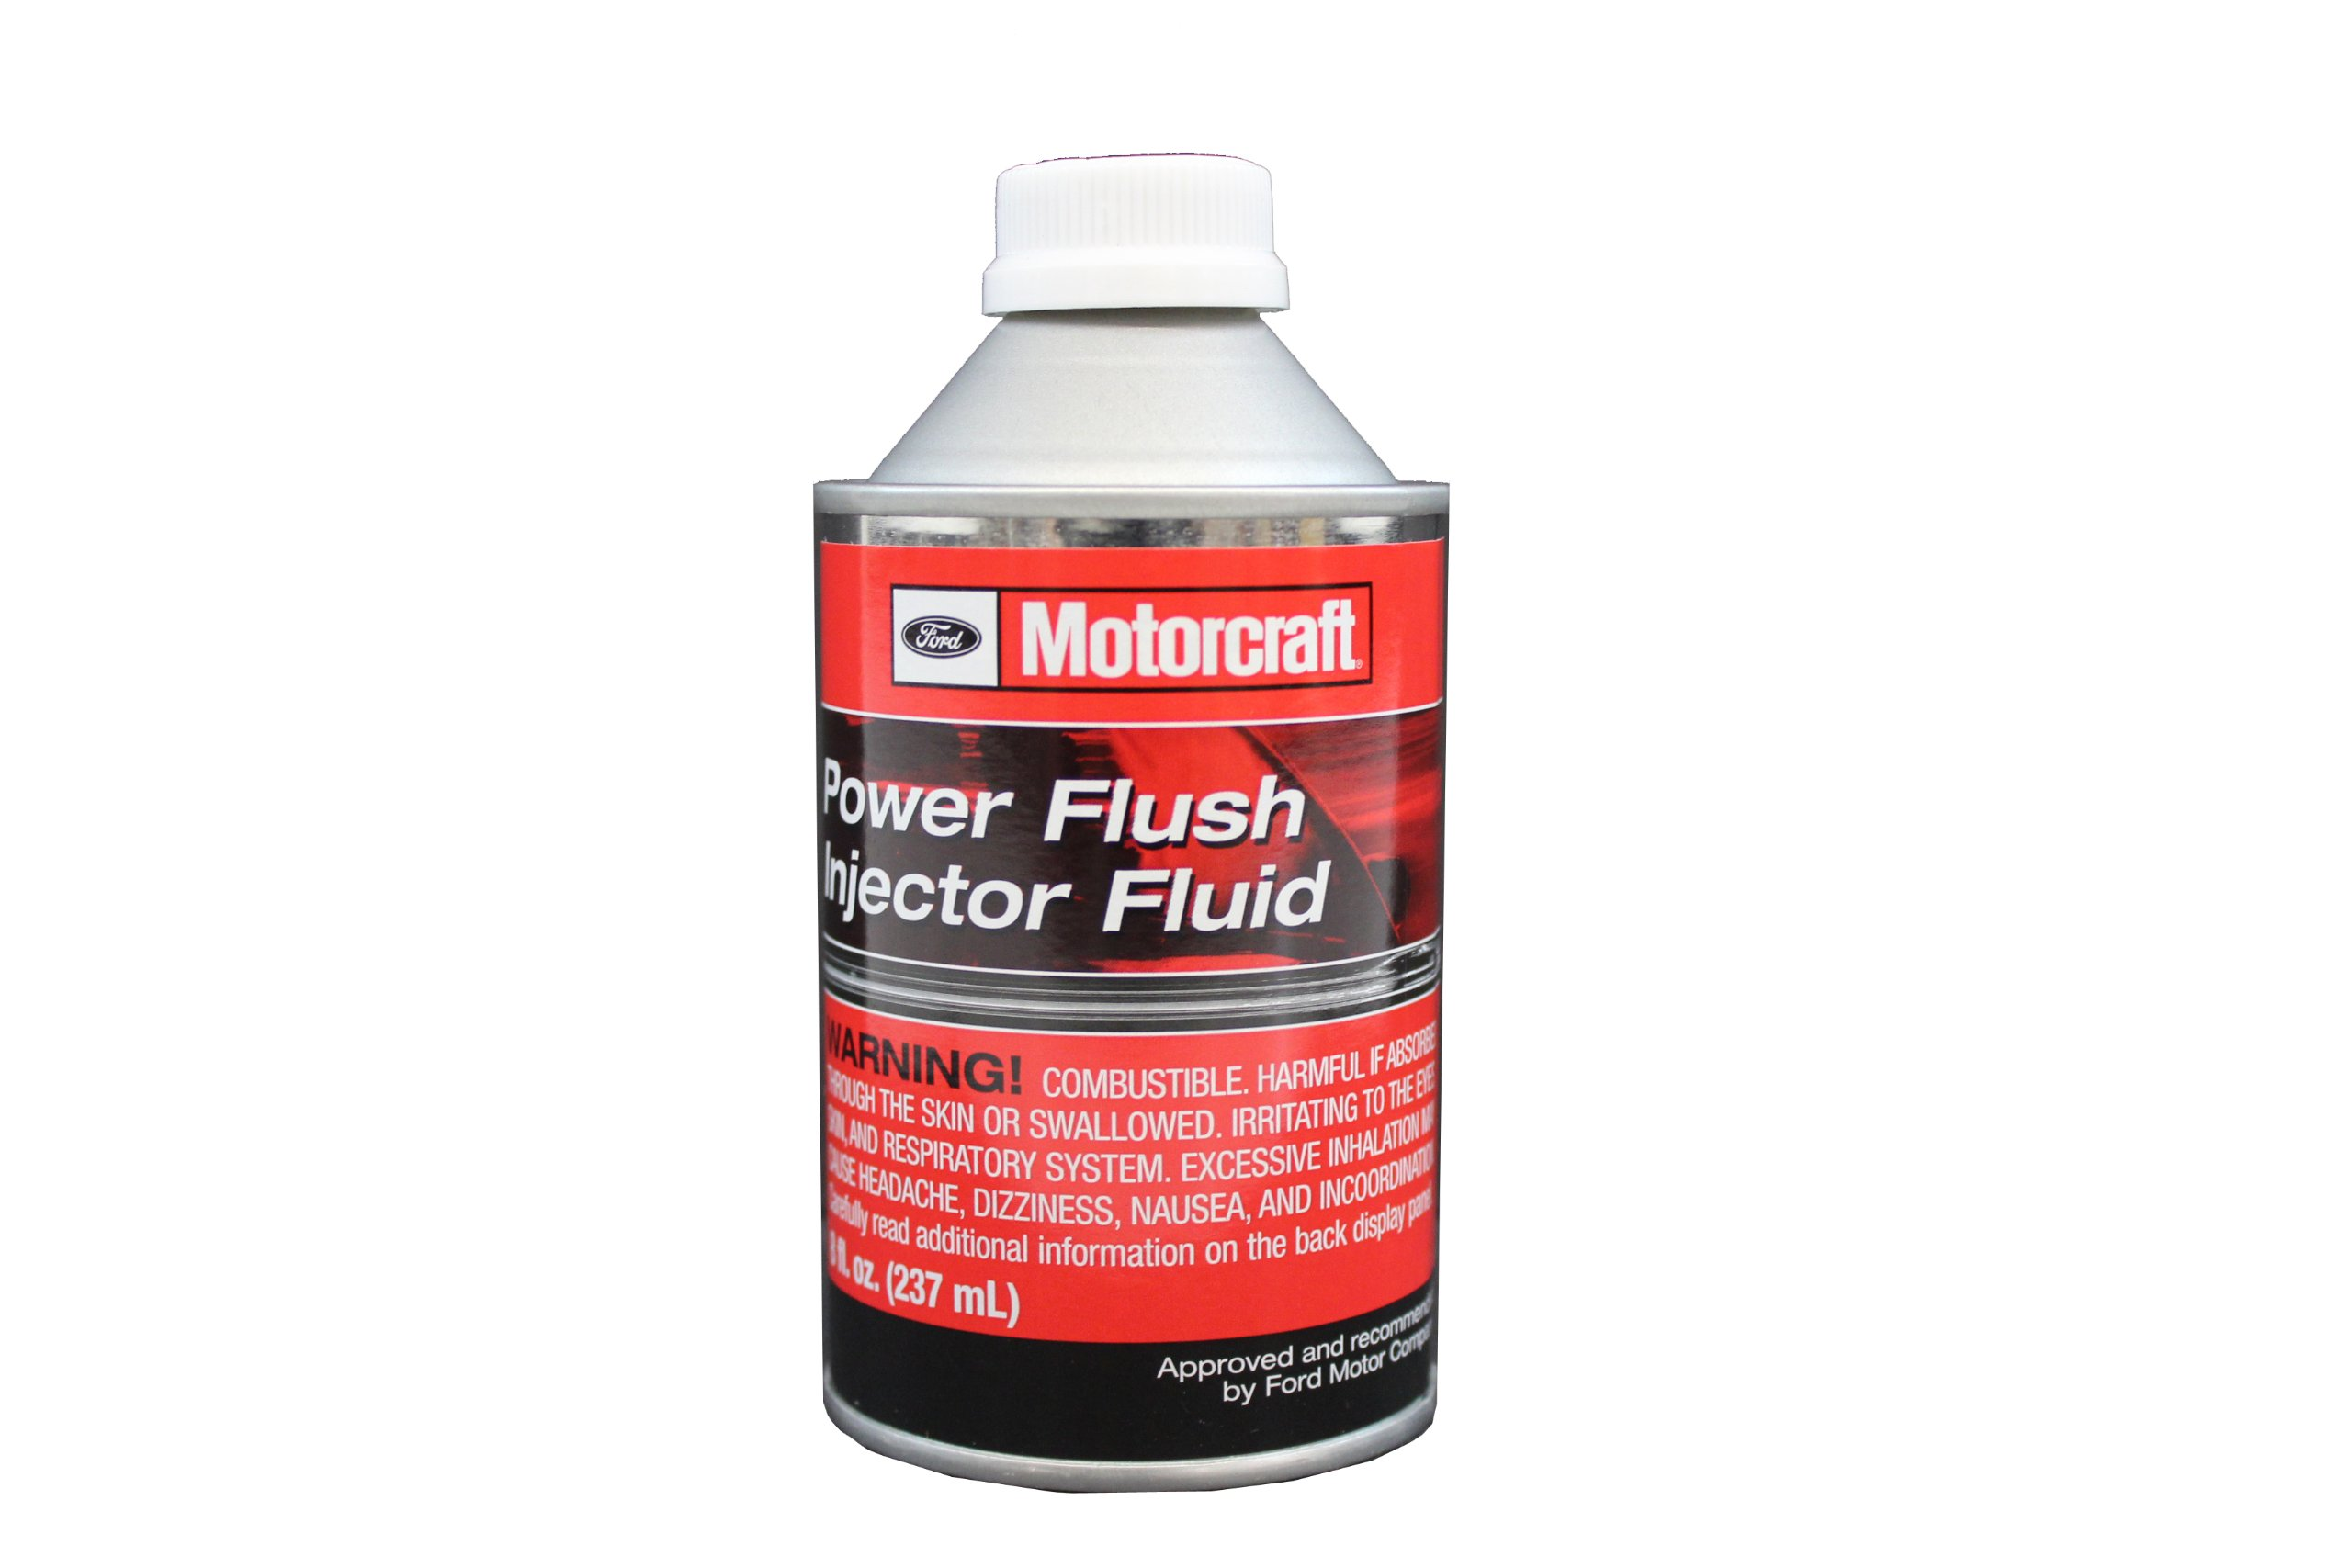 Ford Genuine Fluid PM-5 Power Flush Injector Fluid - 8 oz.